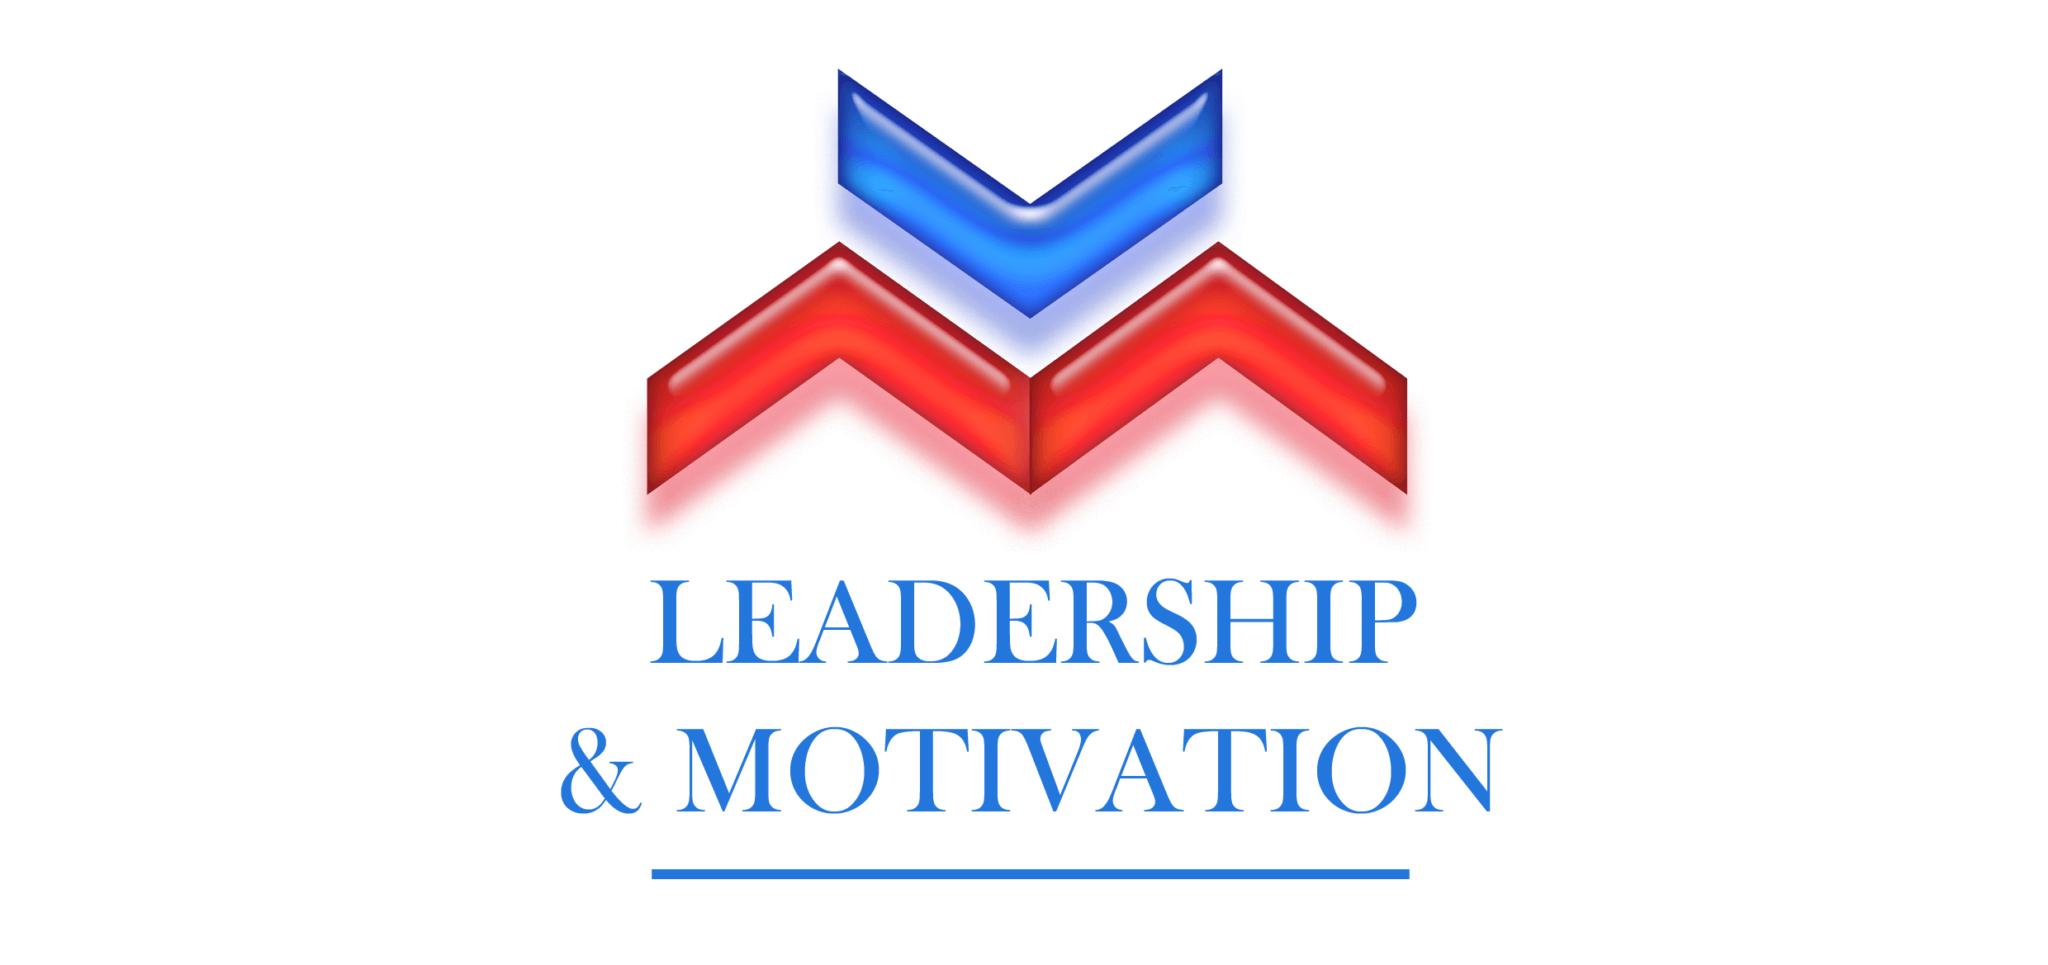 Leadership & Motivation from Matrix Development